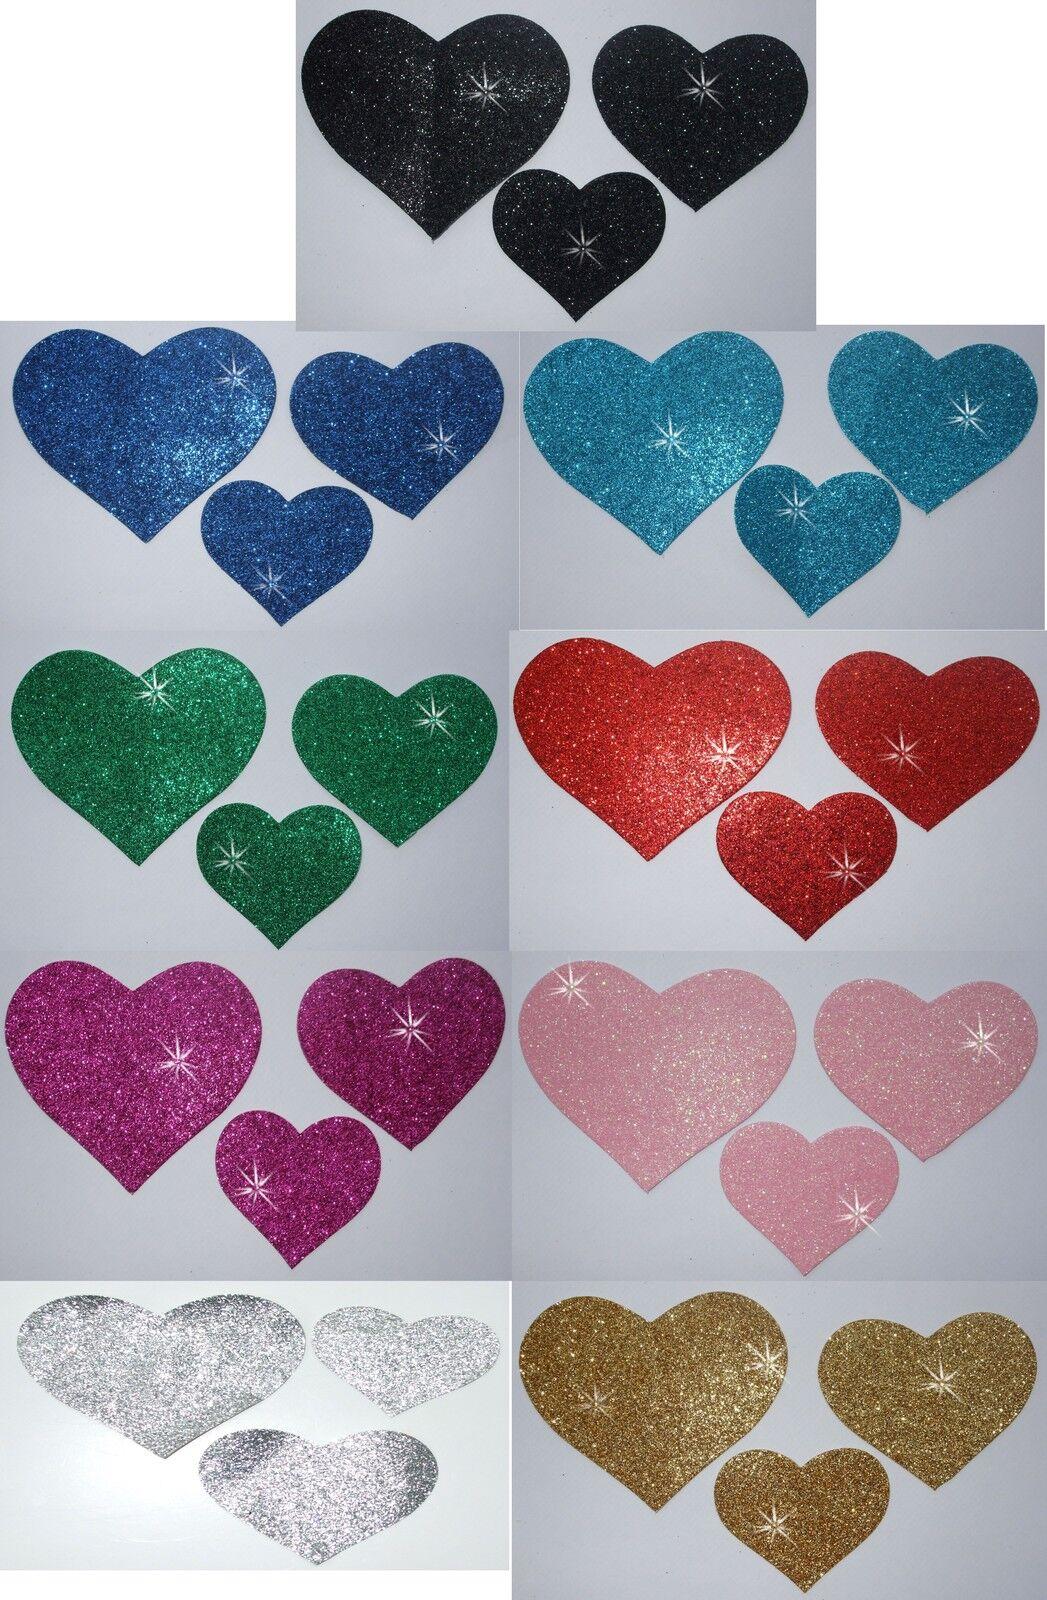 FABRIC GLITTER 3 HEART IRON-ON Kid birthday party craft fun activity patch